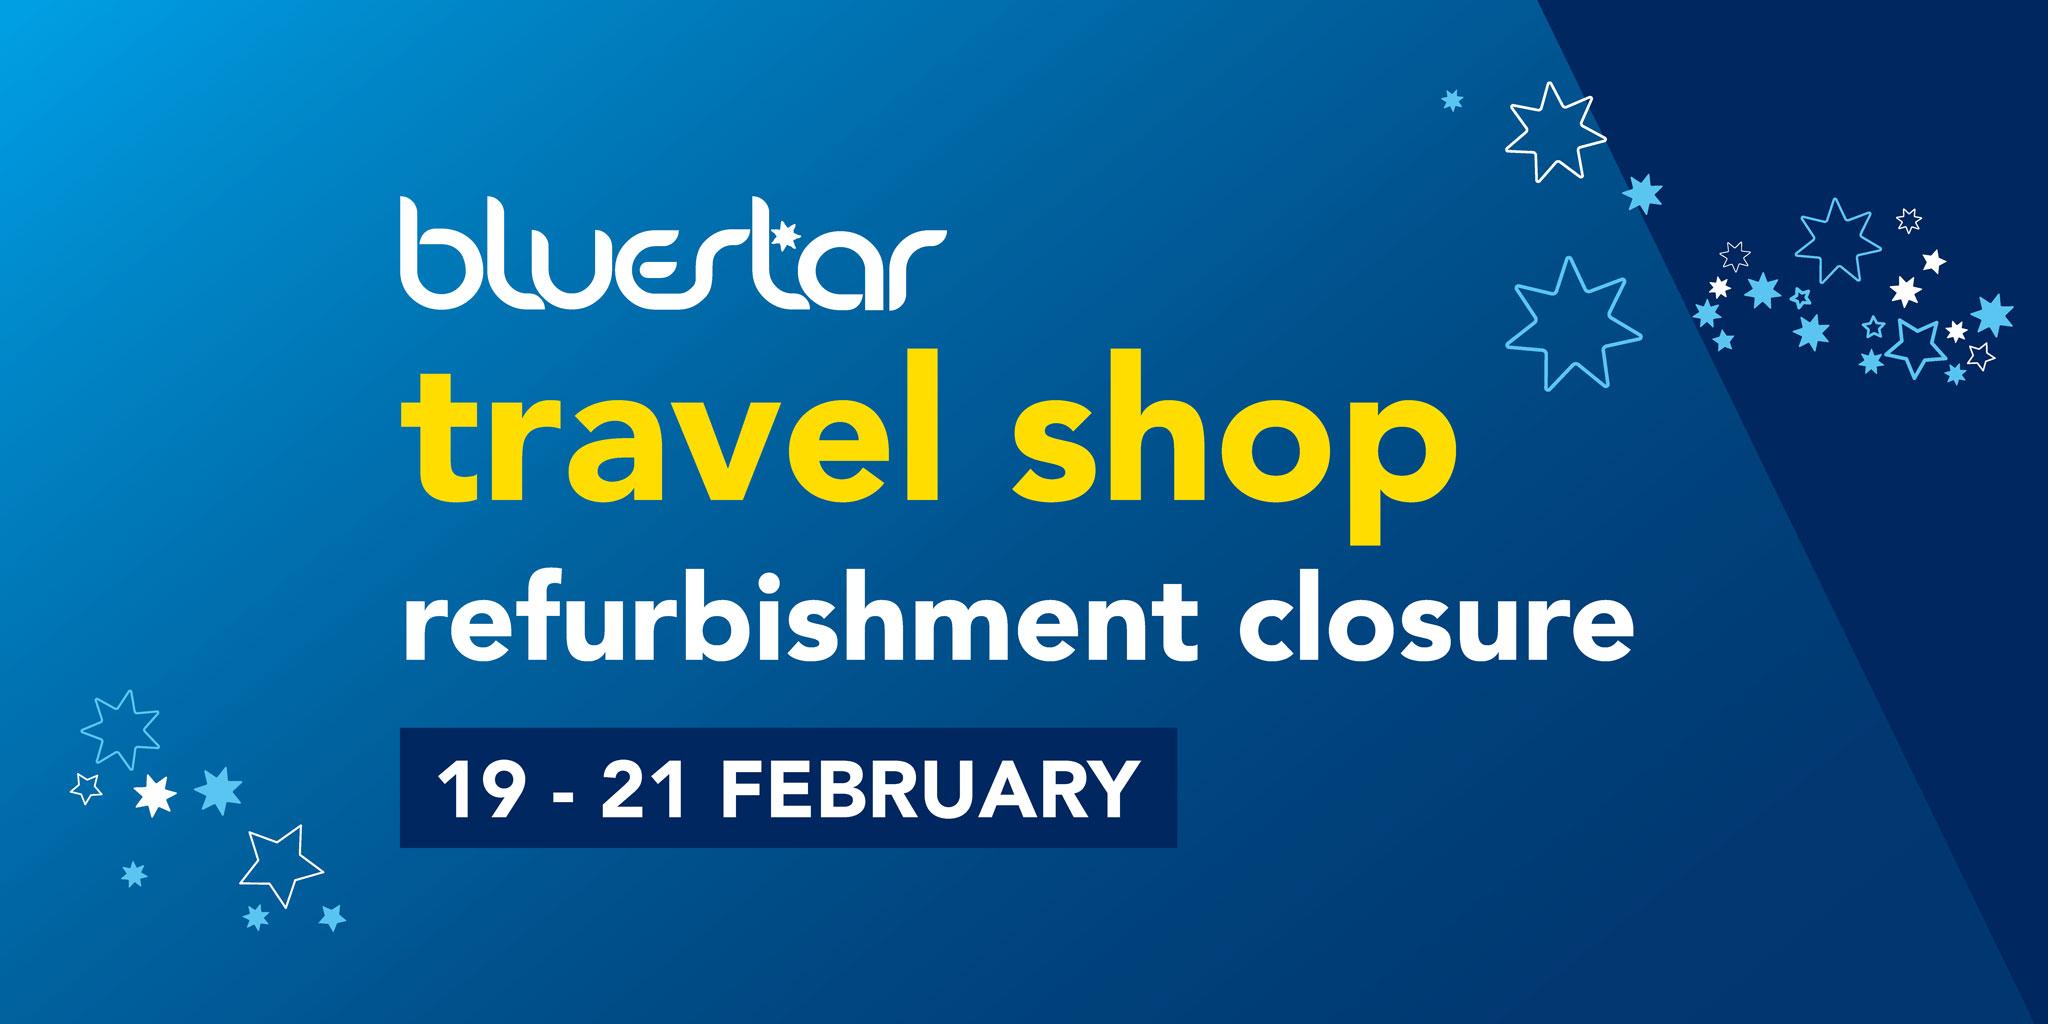 Image reading 'bluestar travel shop refurbishment closure. 19th - 21st February'